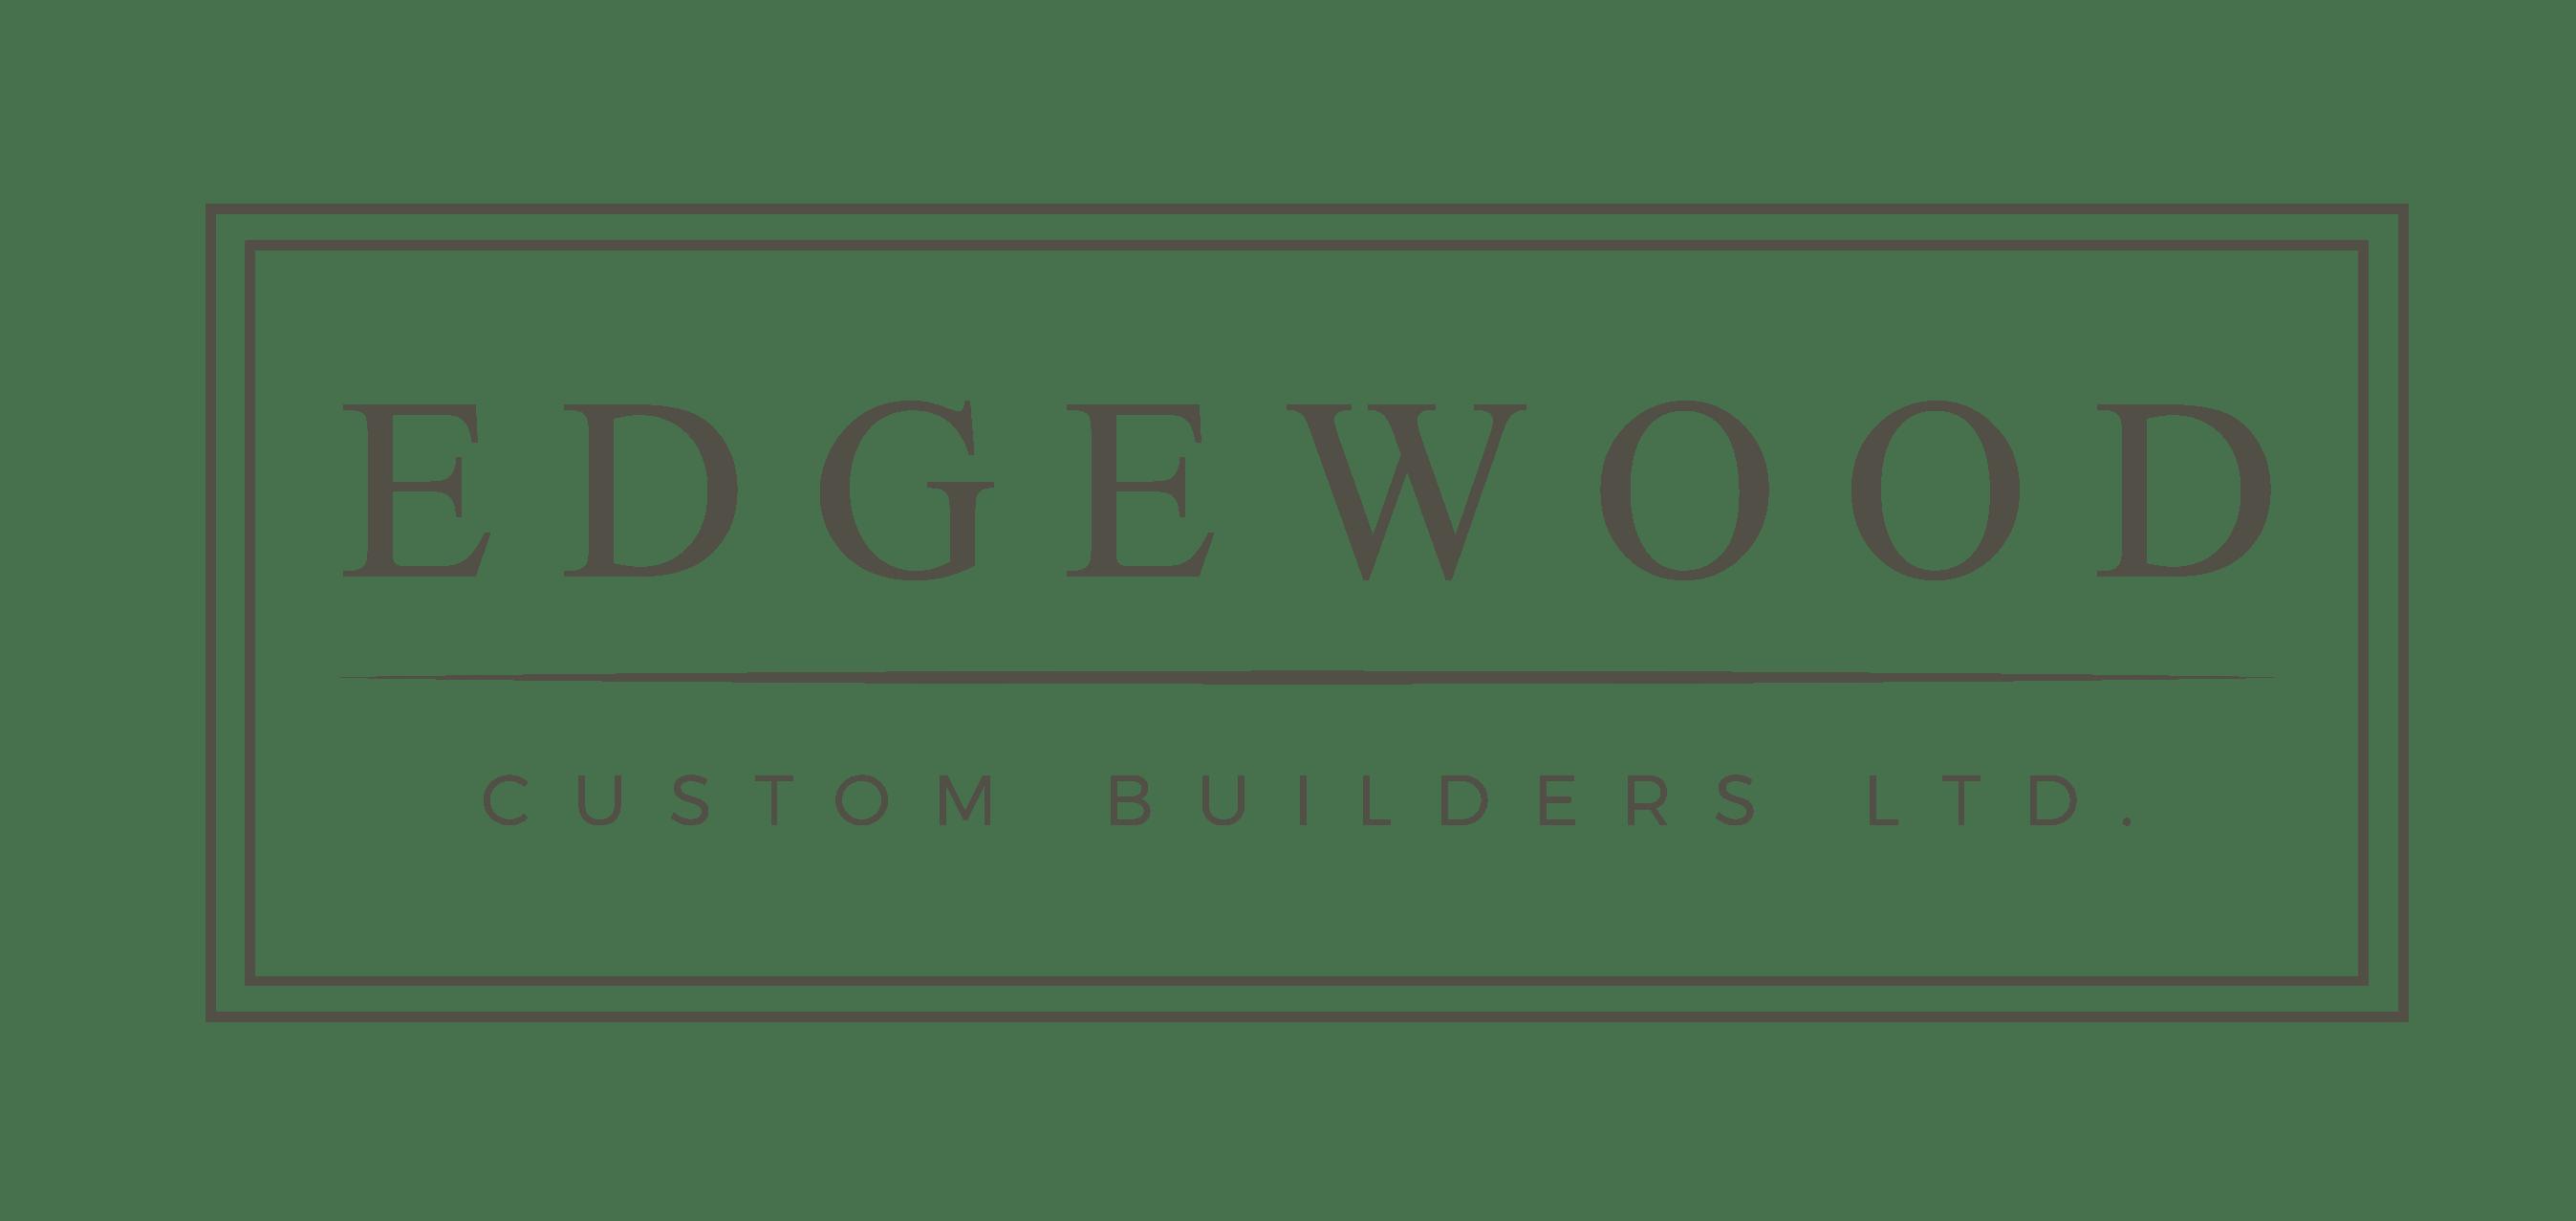 Edgewood - transp_bg CROP